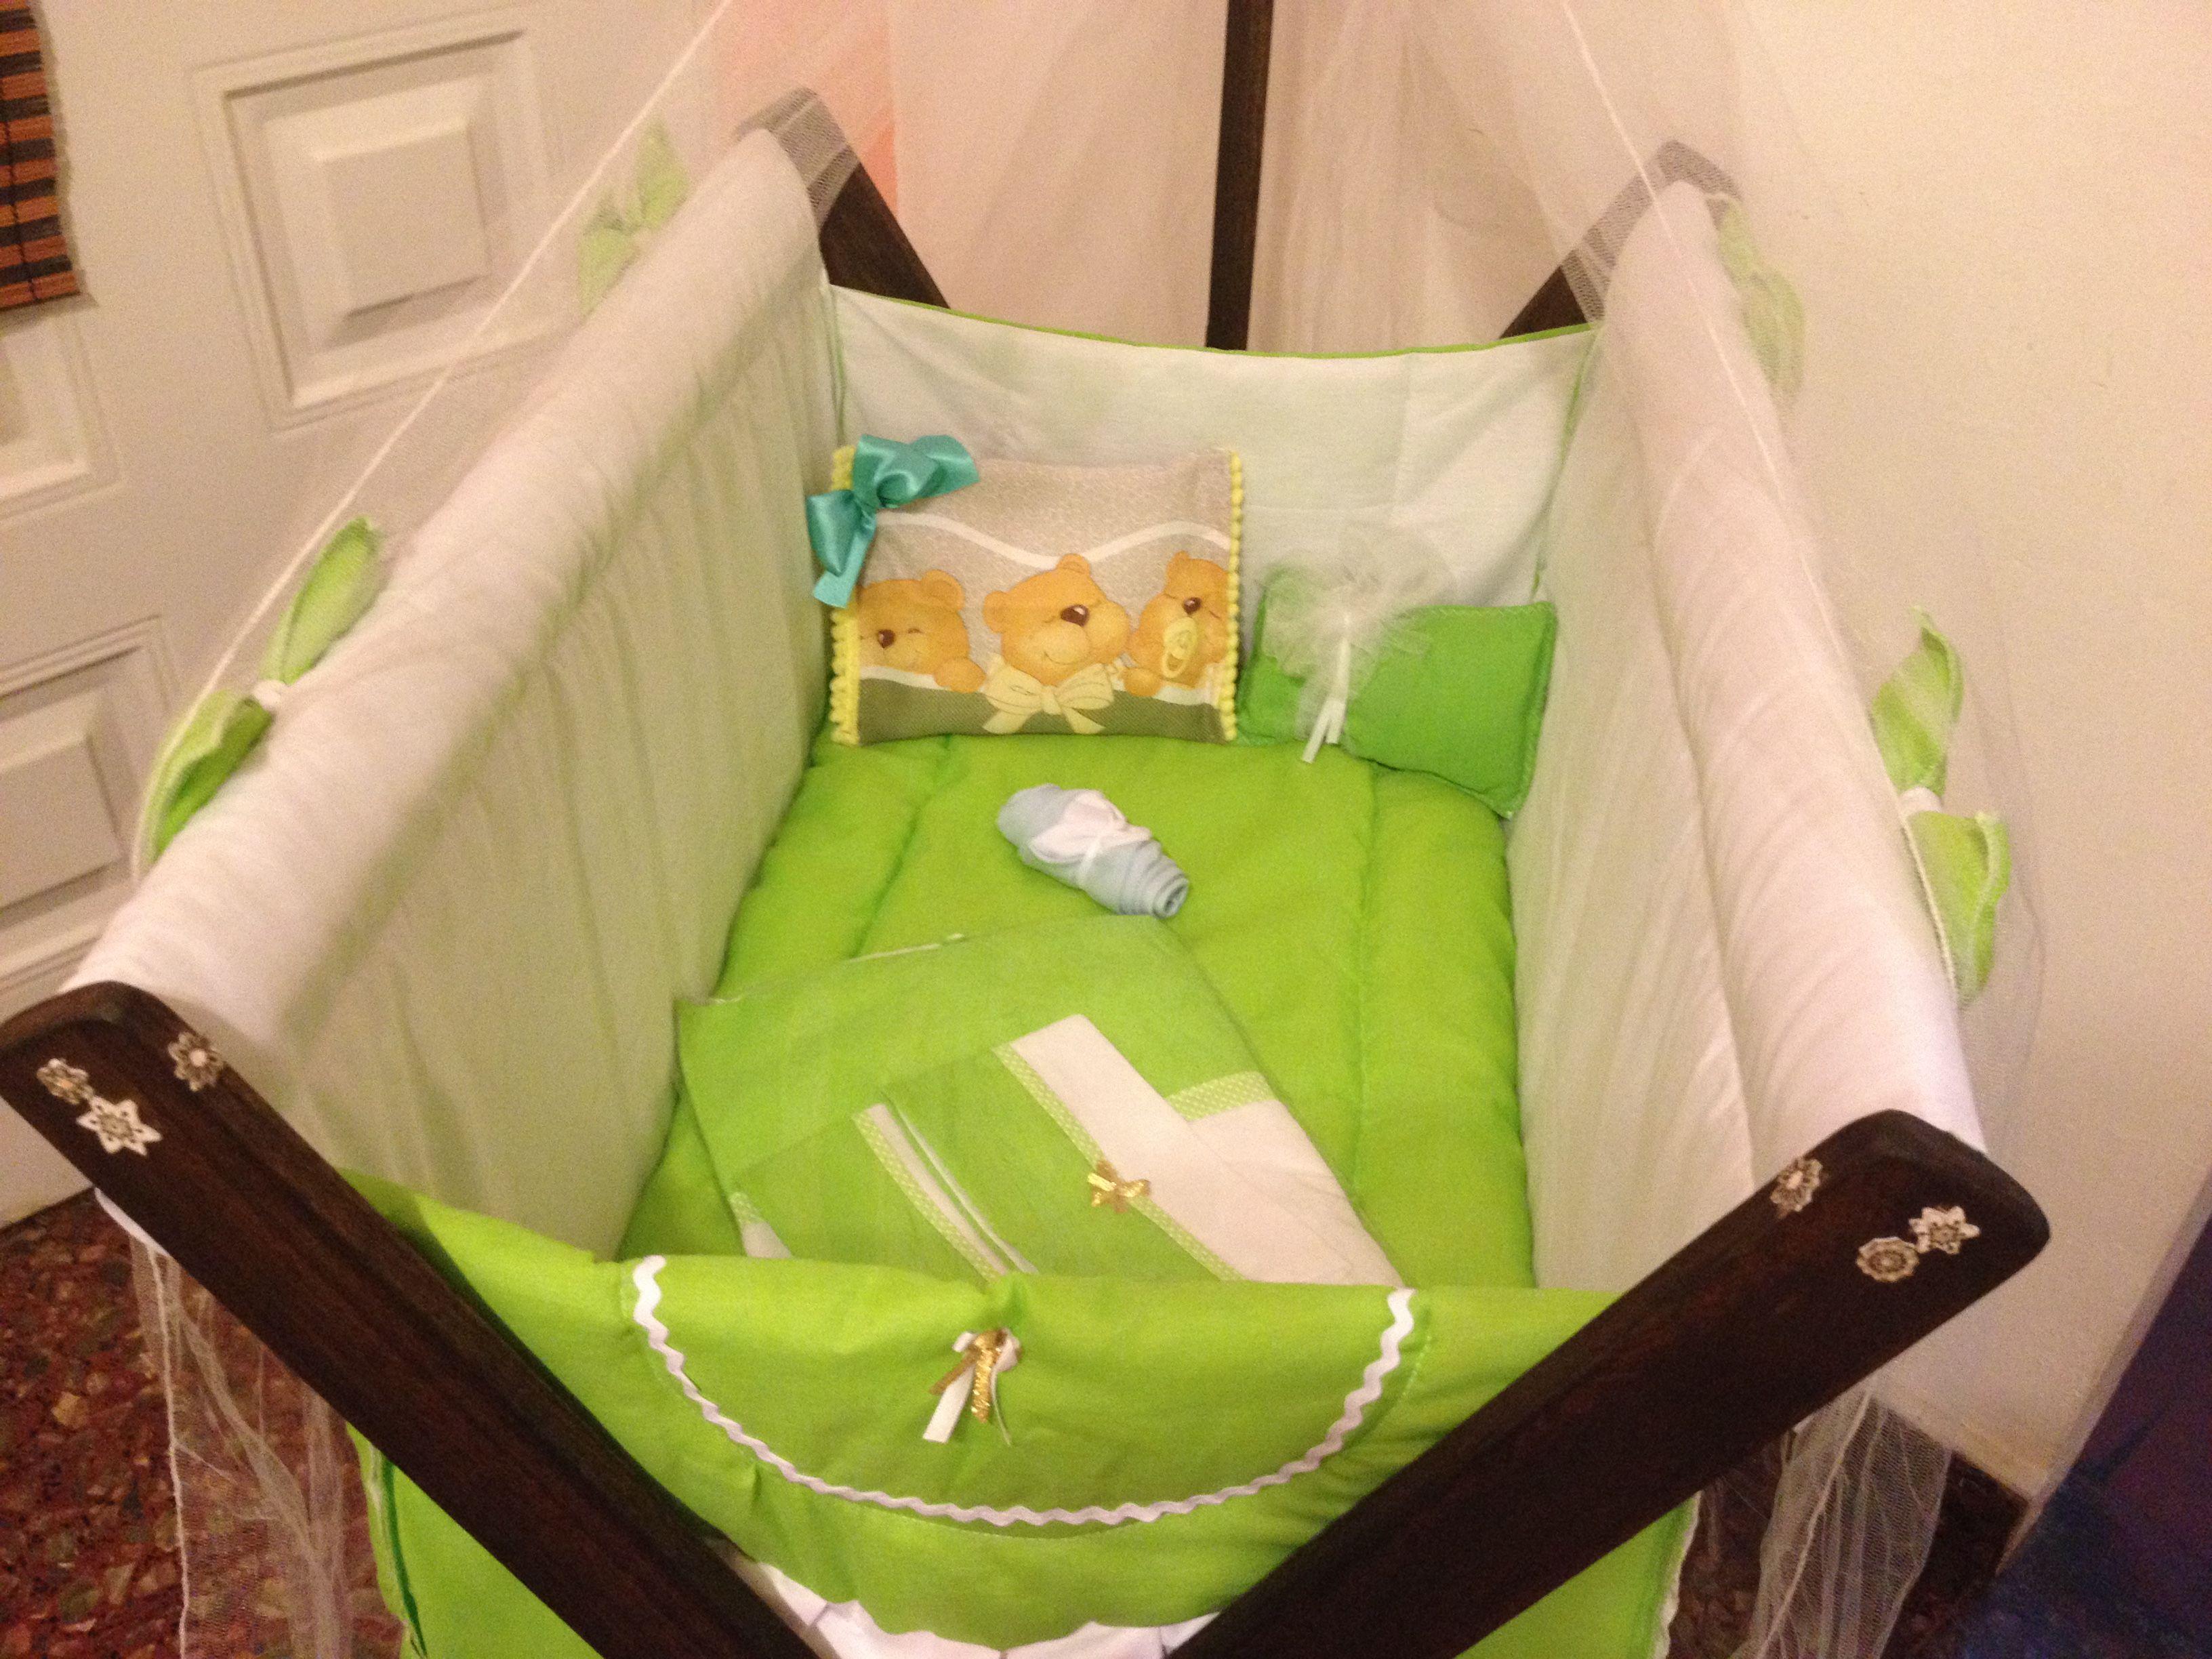 e27b3243d Te decoramos el catre para tu bebé!!! Alejandra de Catre Alexis bebe07  15-6279-8647, whatsapp.